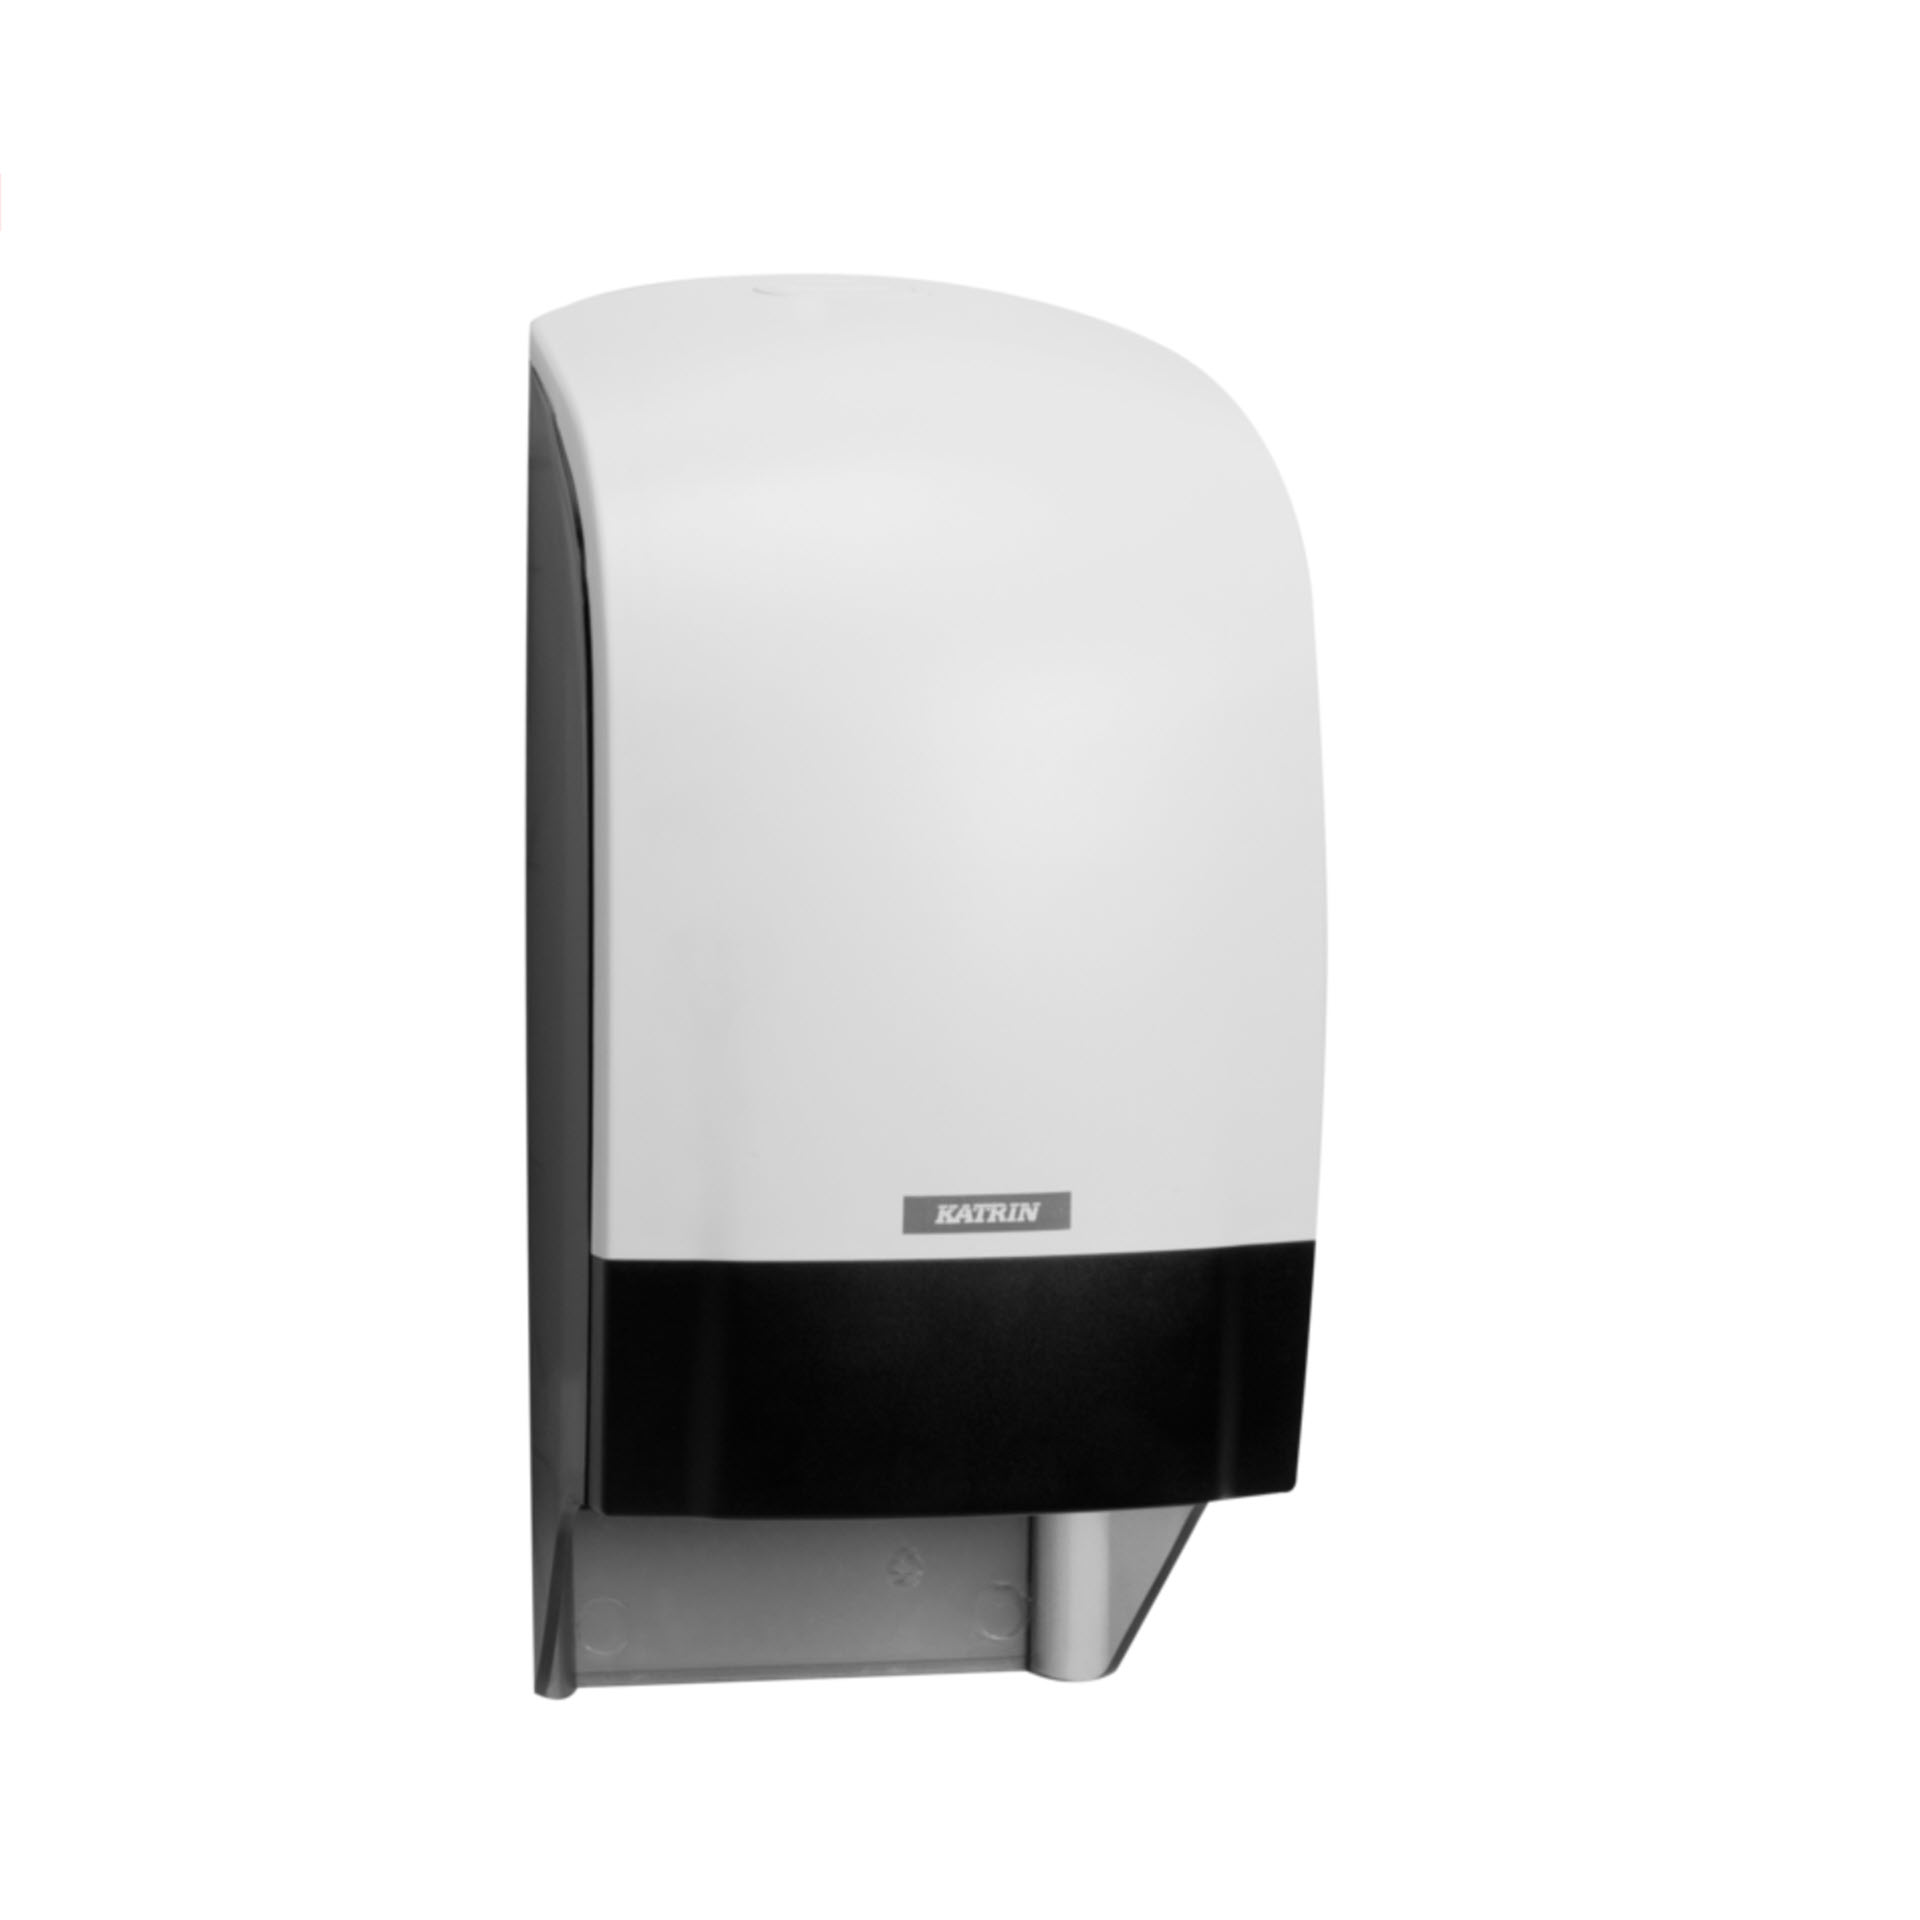 Katrin Inclusive System Toilettenpapierspender - 104582/104605